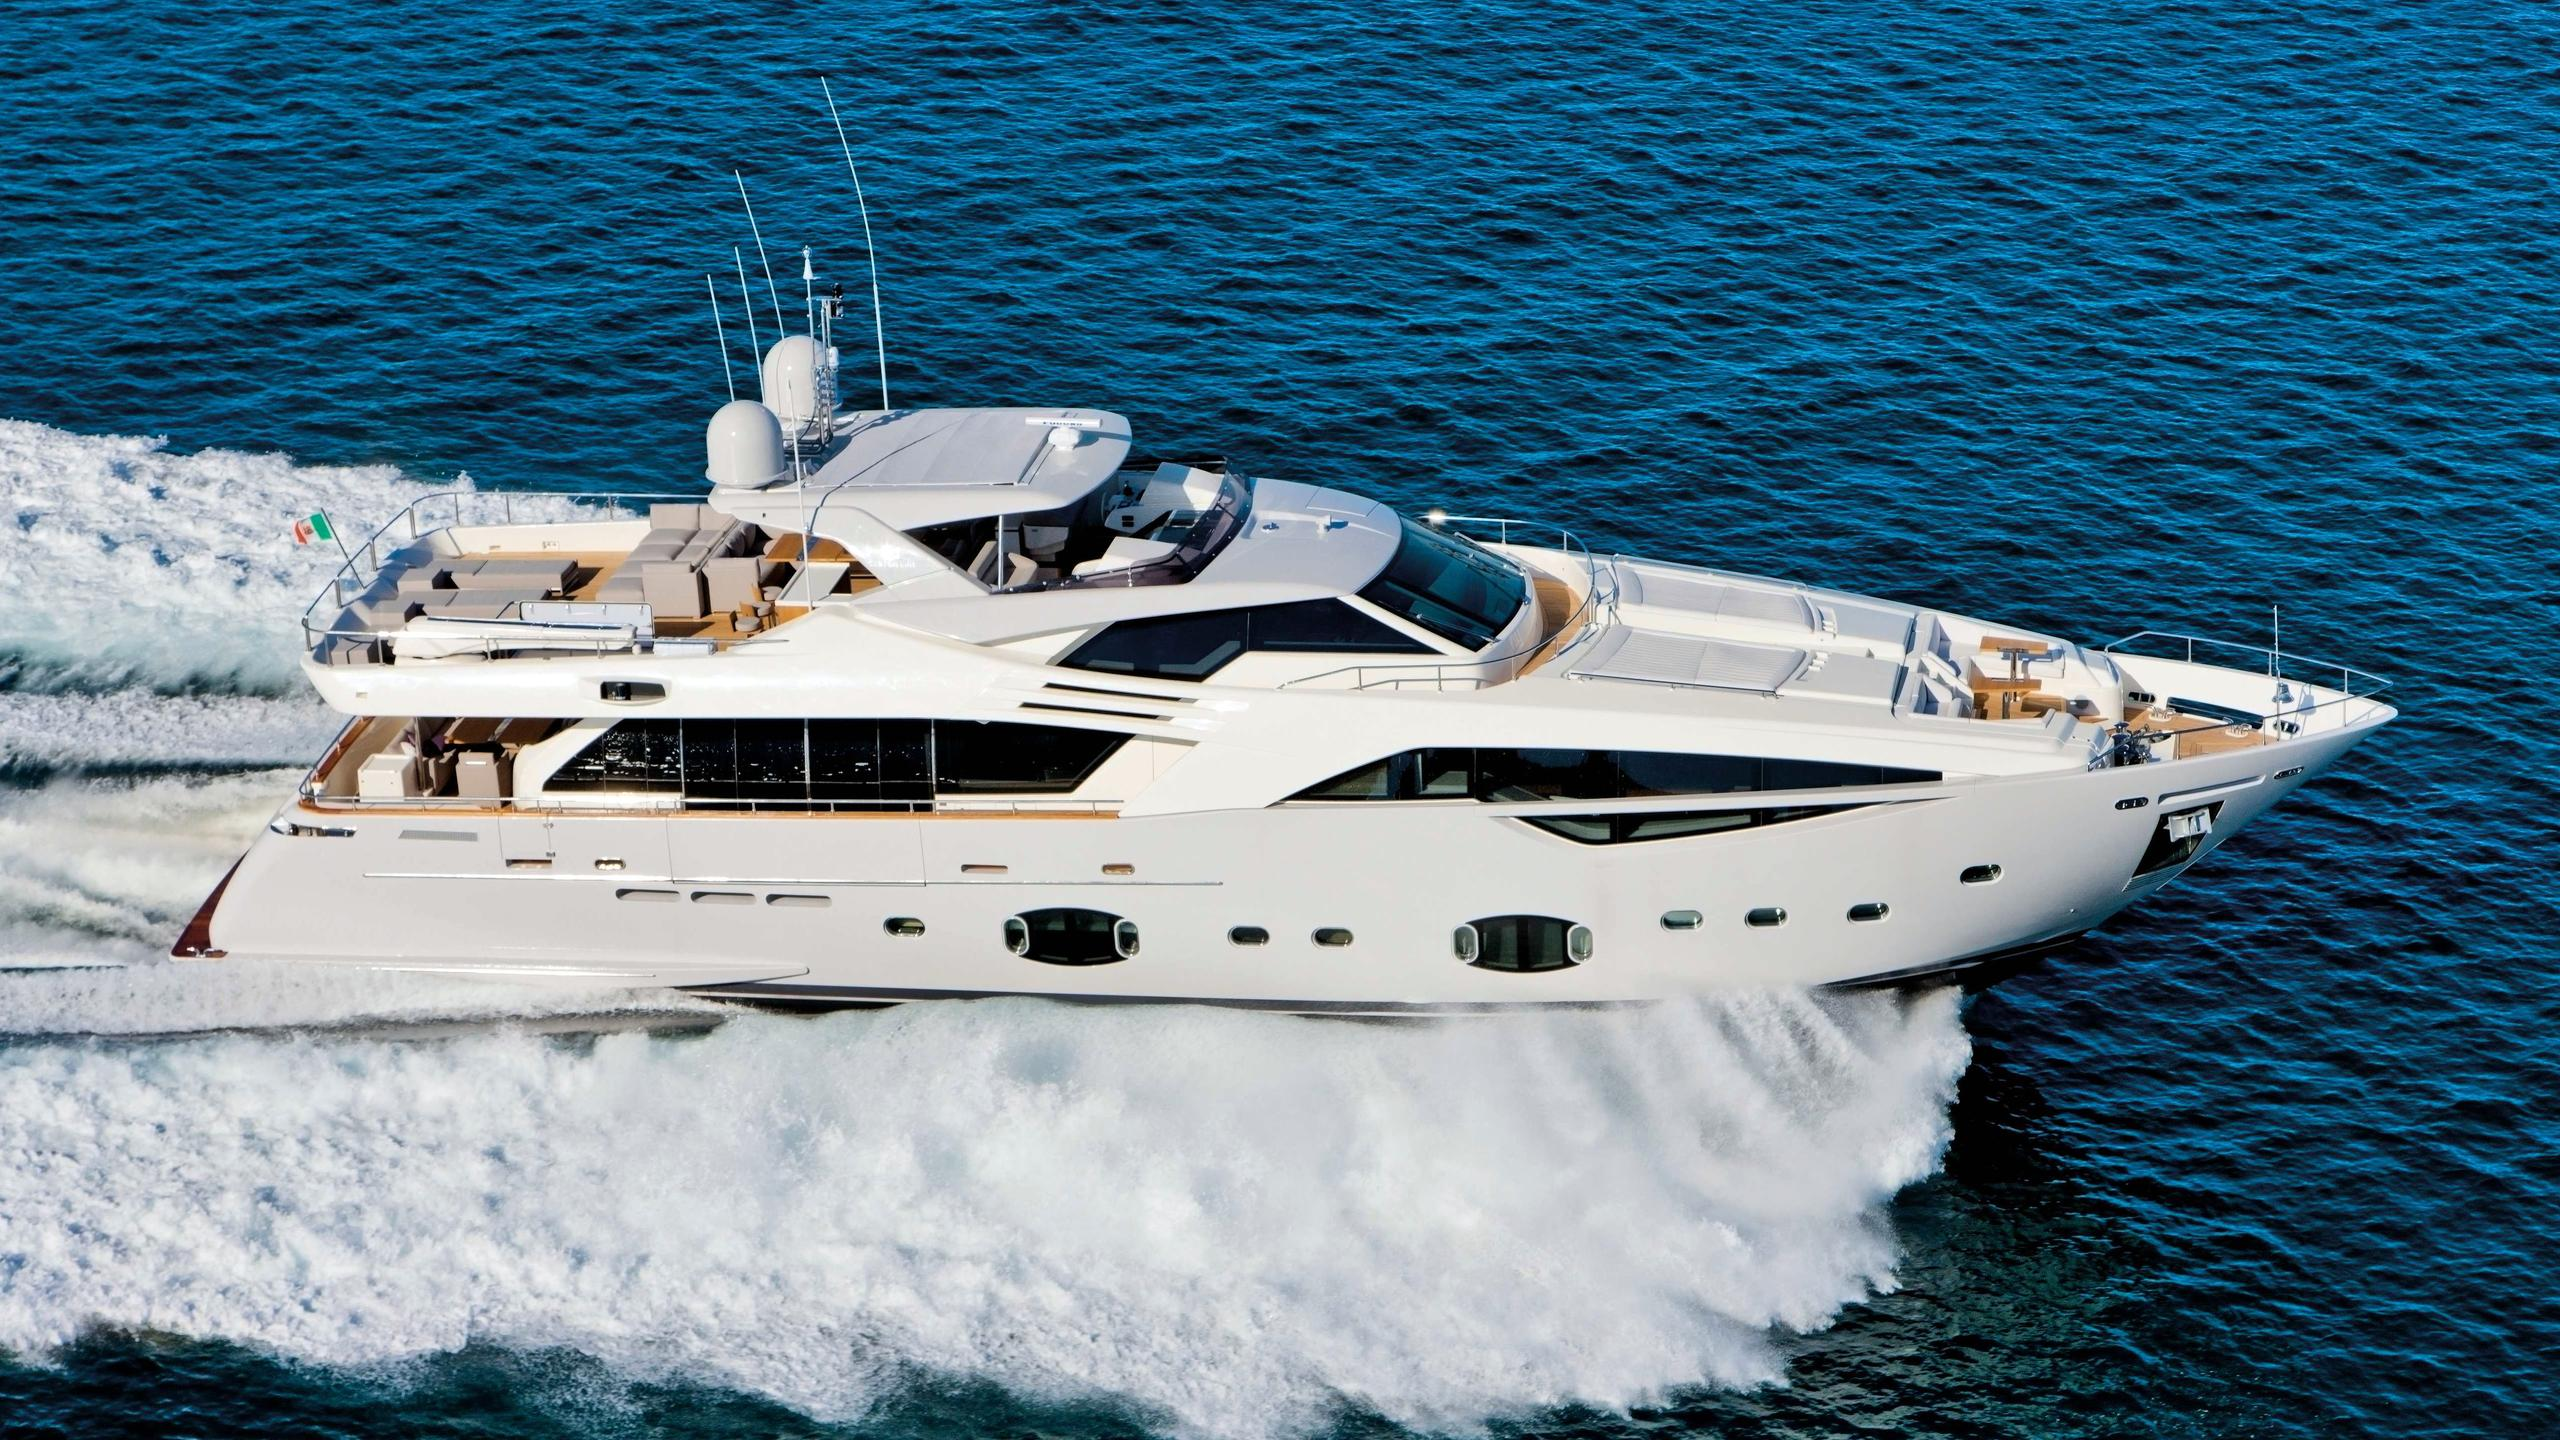 niko-iii-motor-yacht-ferretti-custom-line-100-2012-31m-aerial